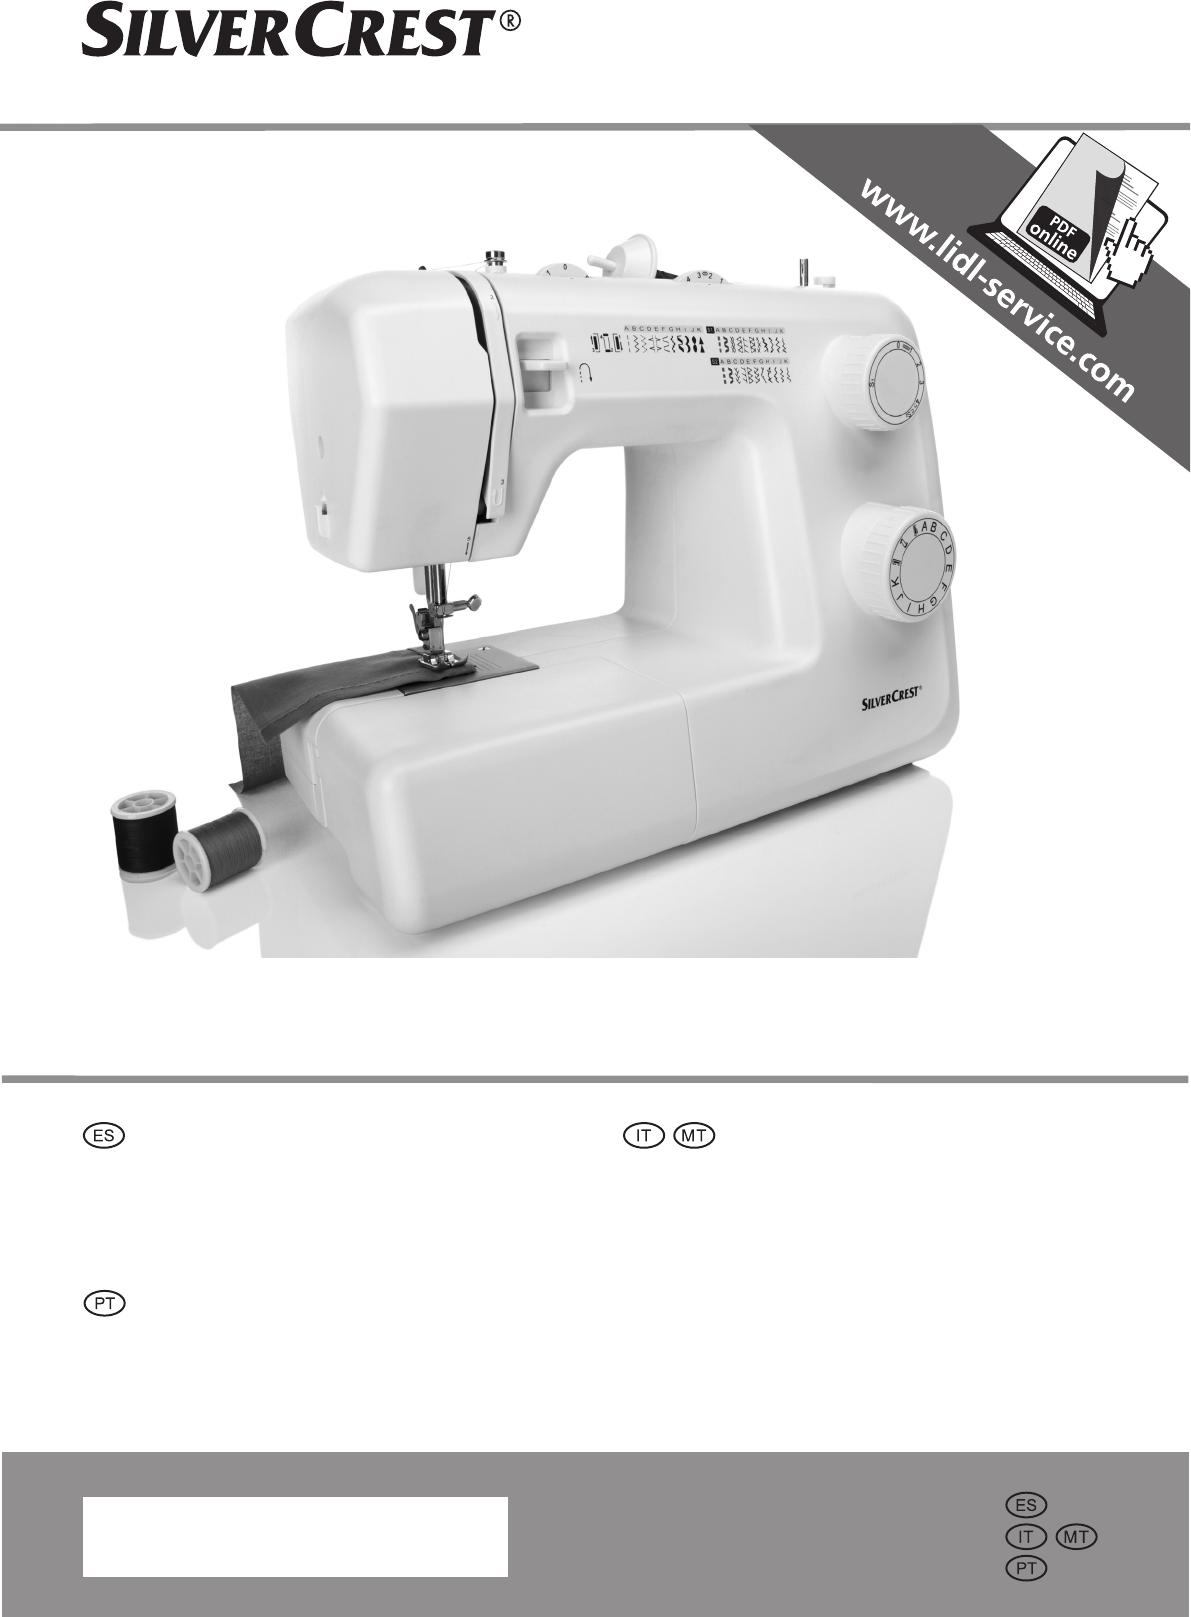 Handleiding silvercrest snm 33 b1 pagina 1 van 72 for Silvercrest macchina da cucire